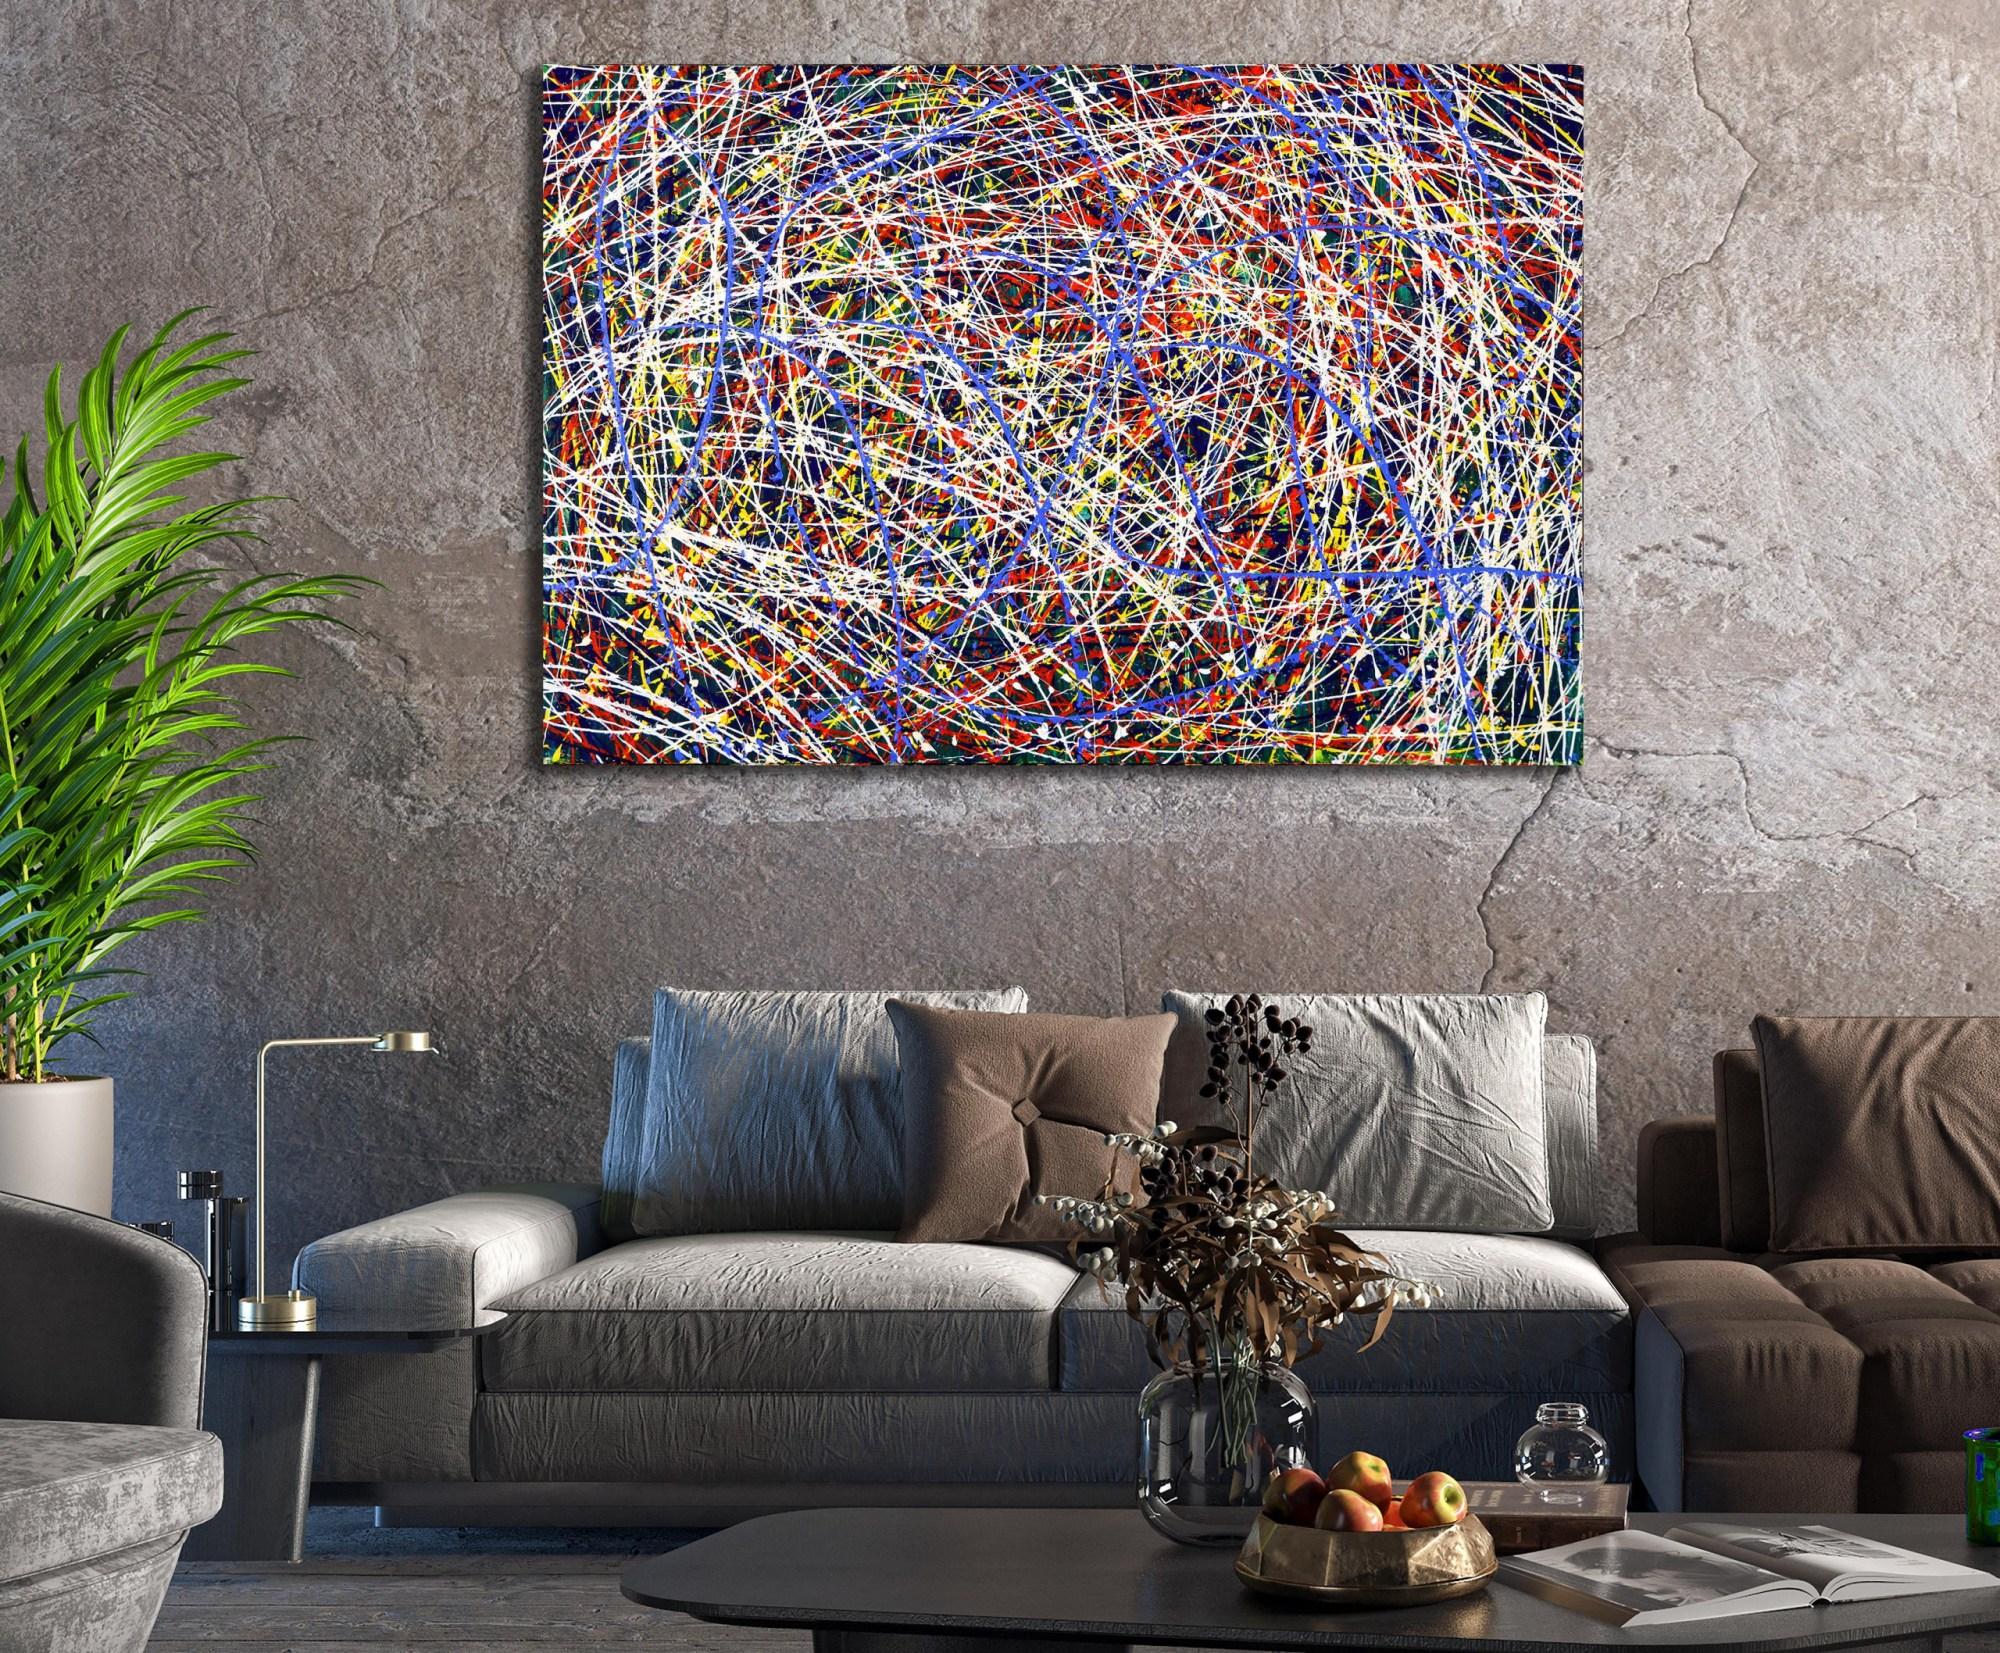 ROOM EXAMPLE / In constant motion (City life) 4 (2021) / Artist: Nestor Toro